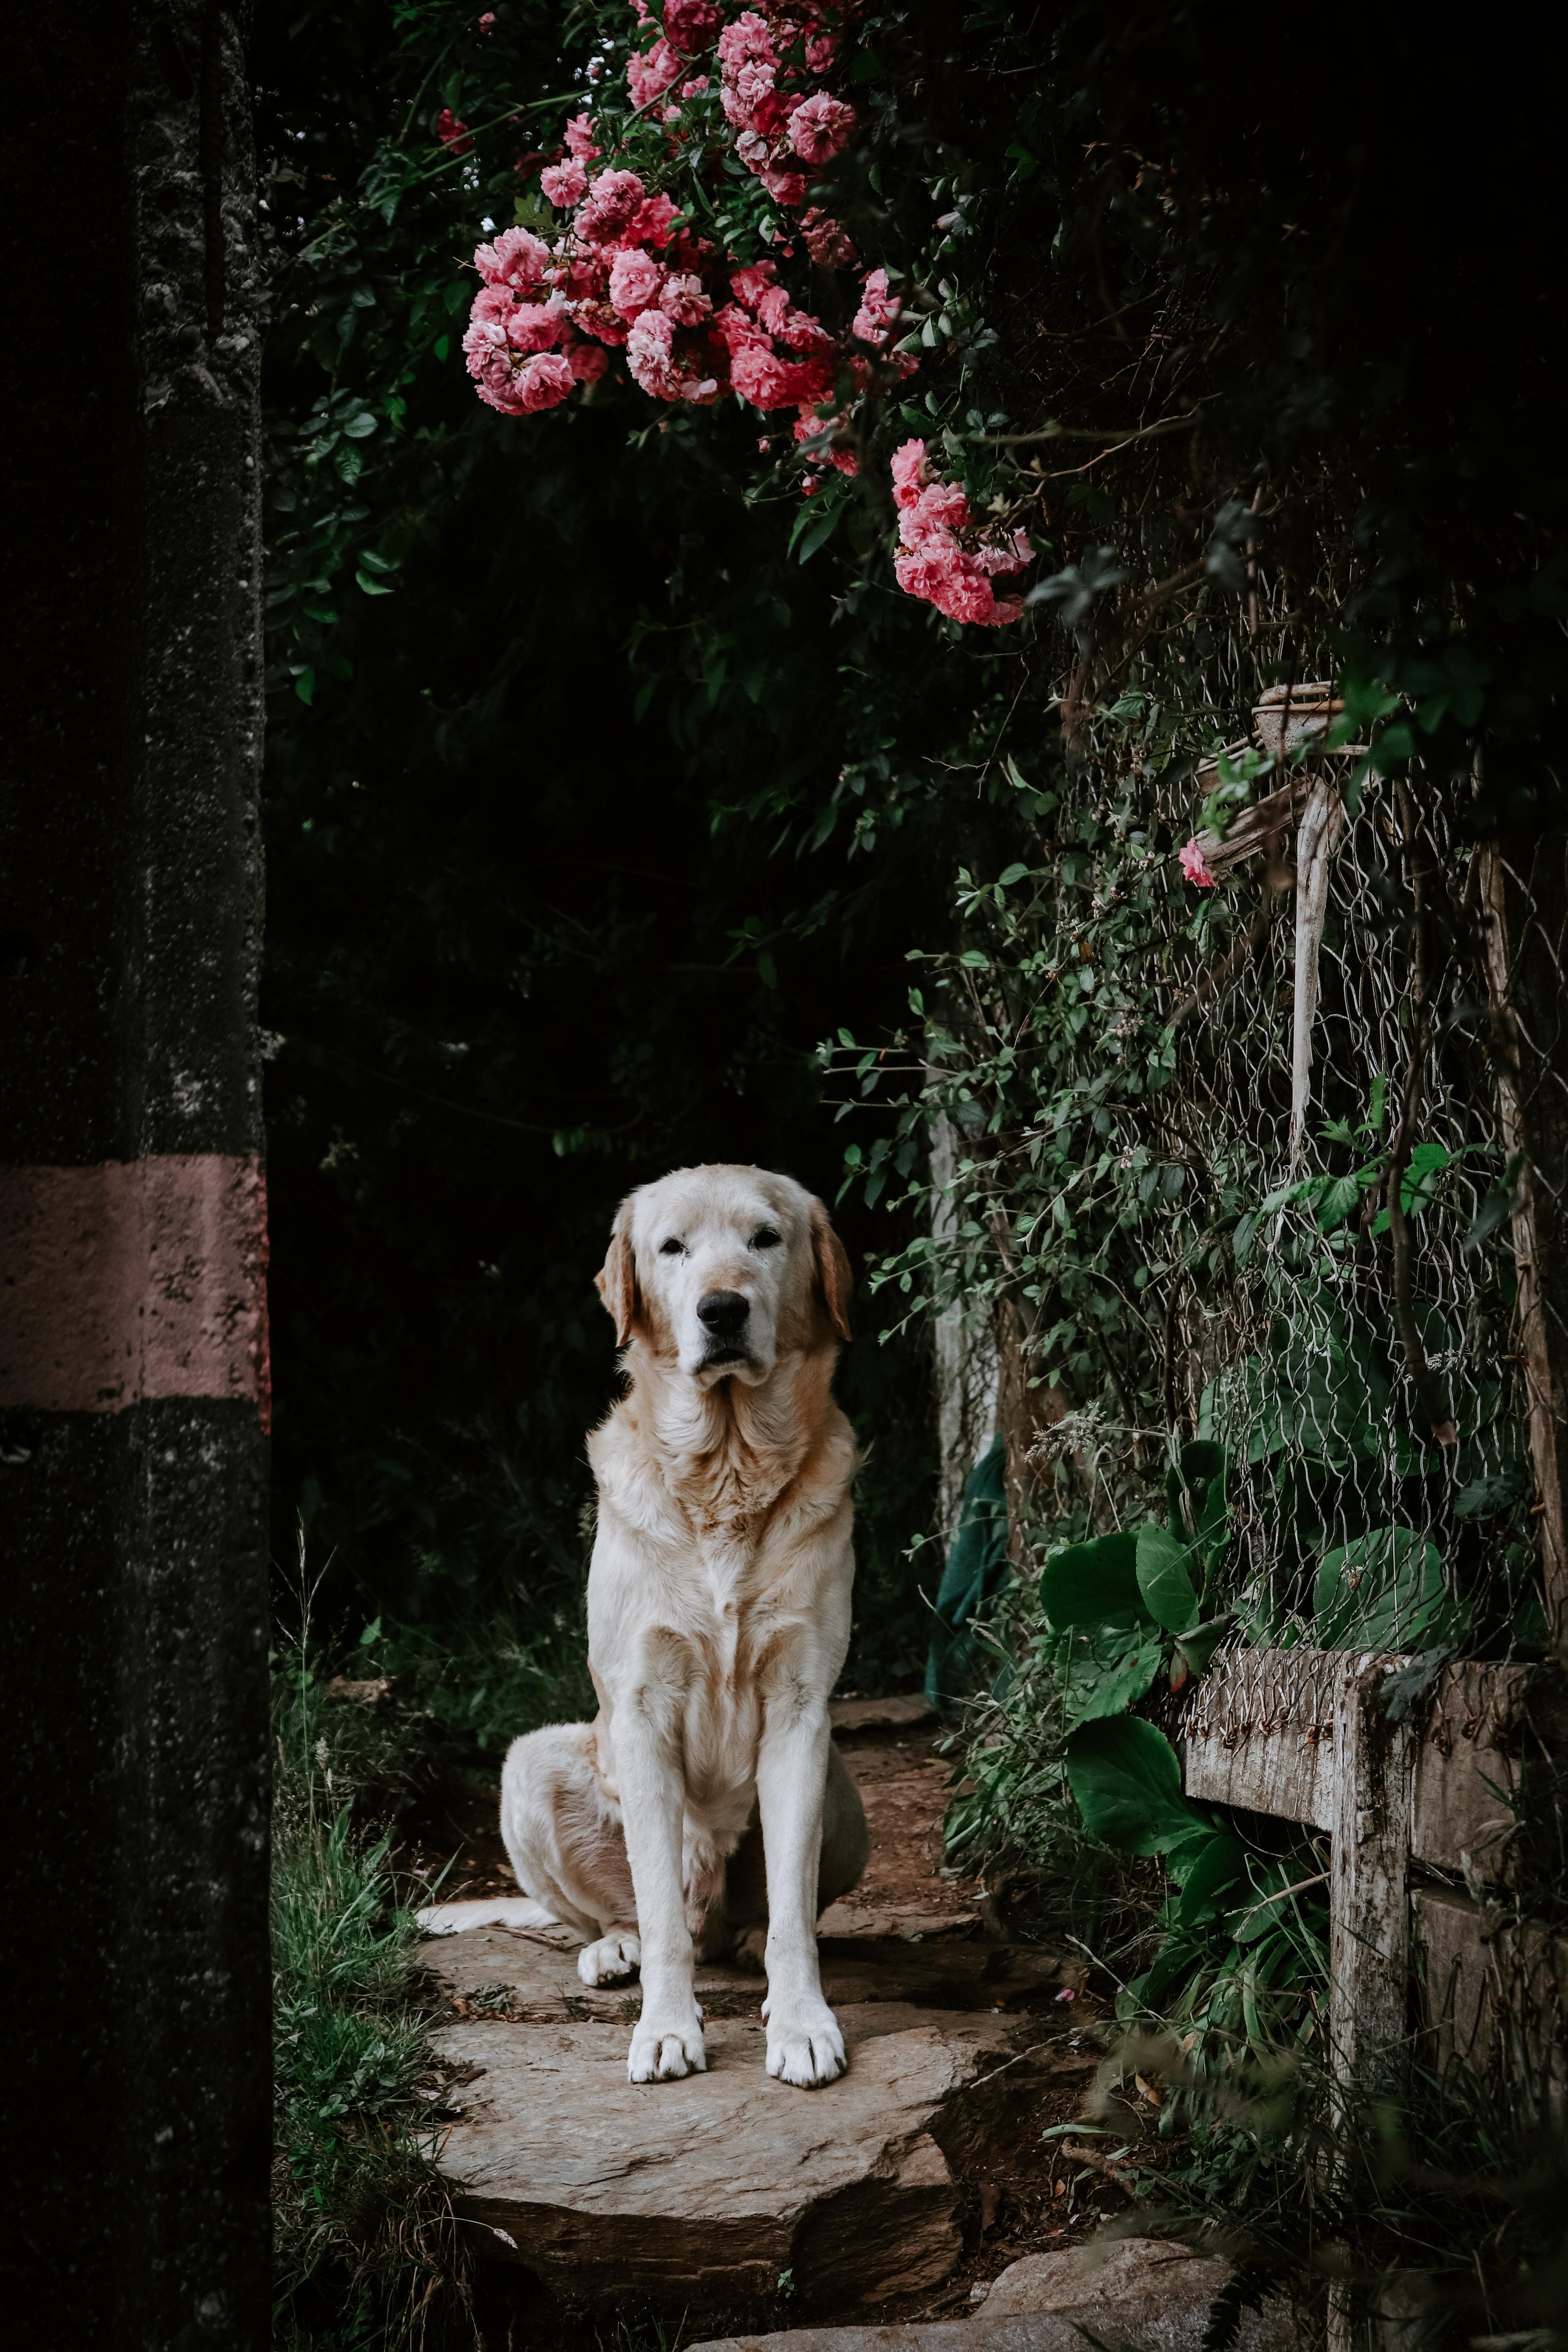 yellow Labrador retriever sitting on pathway